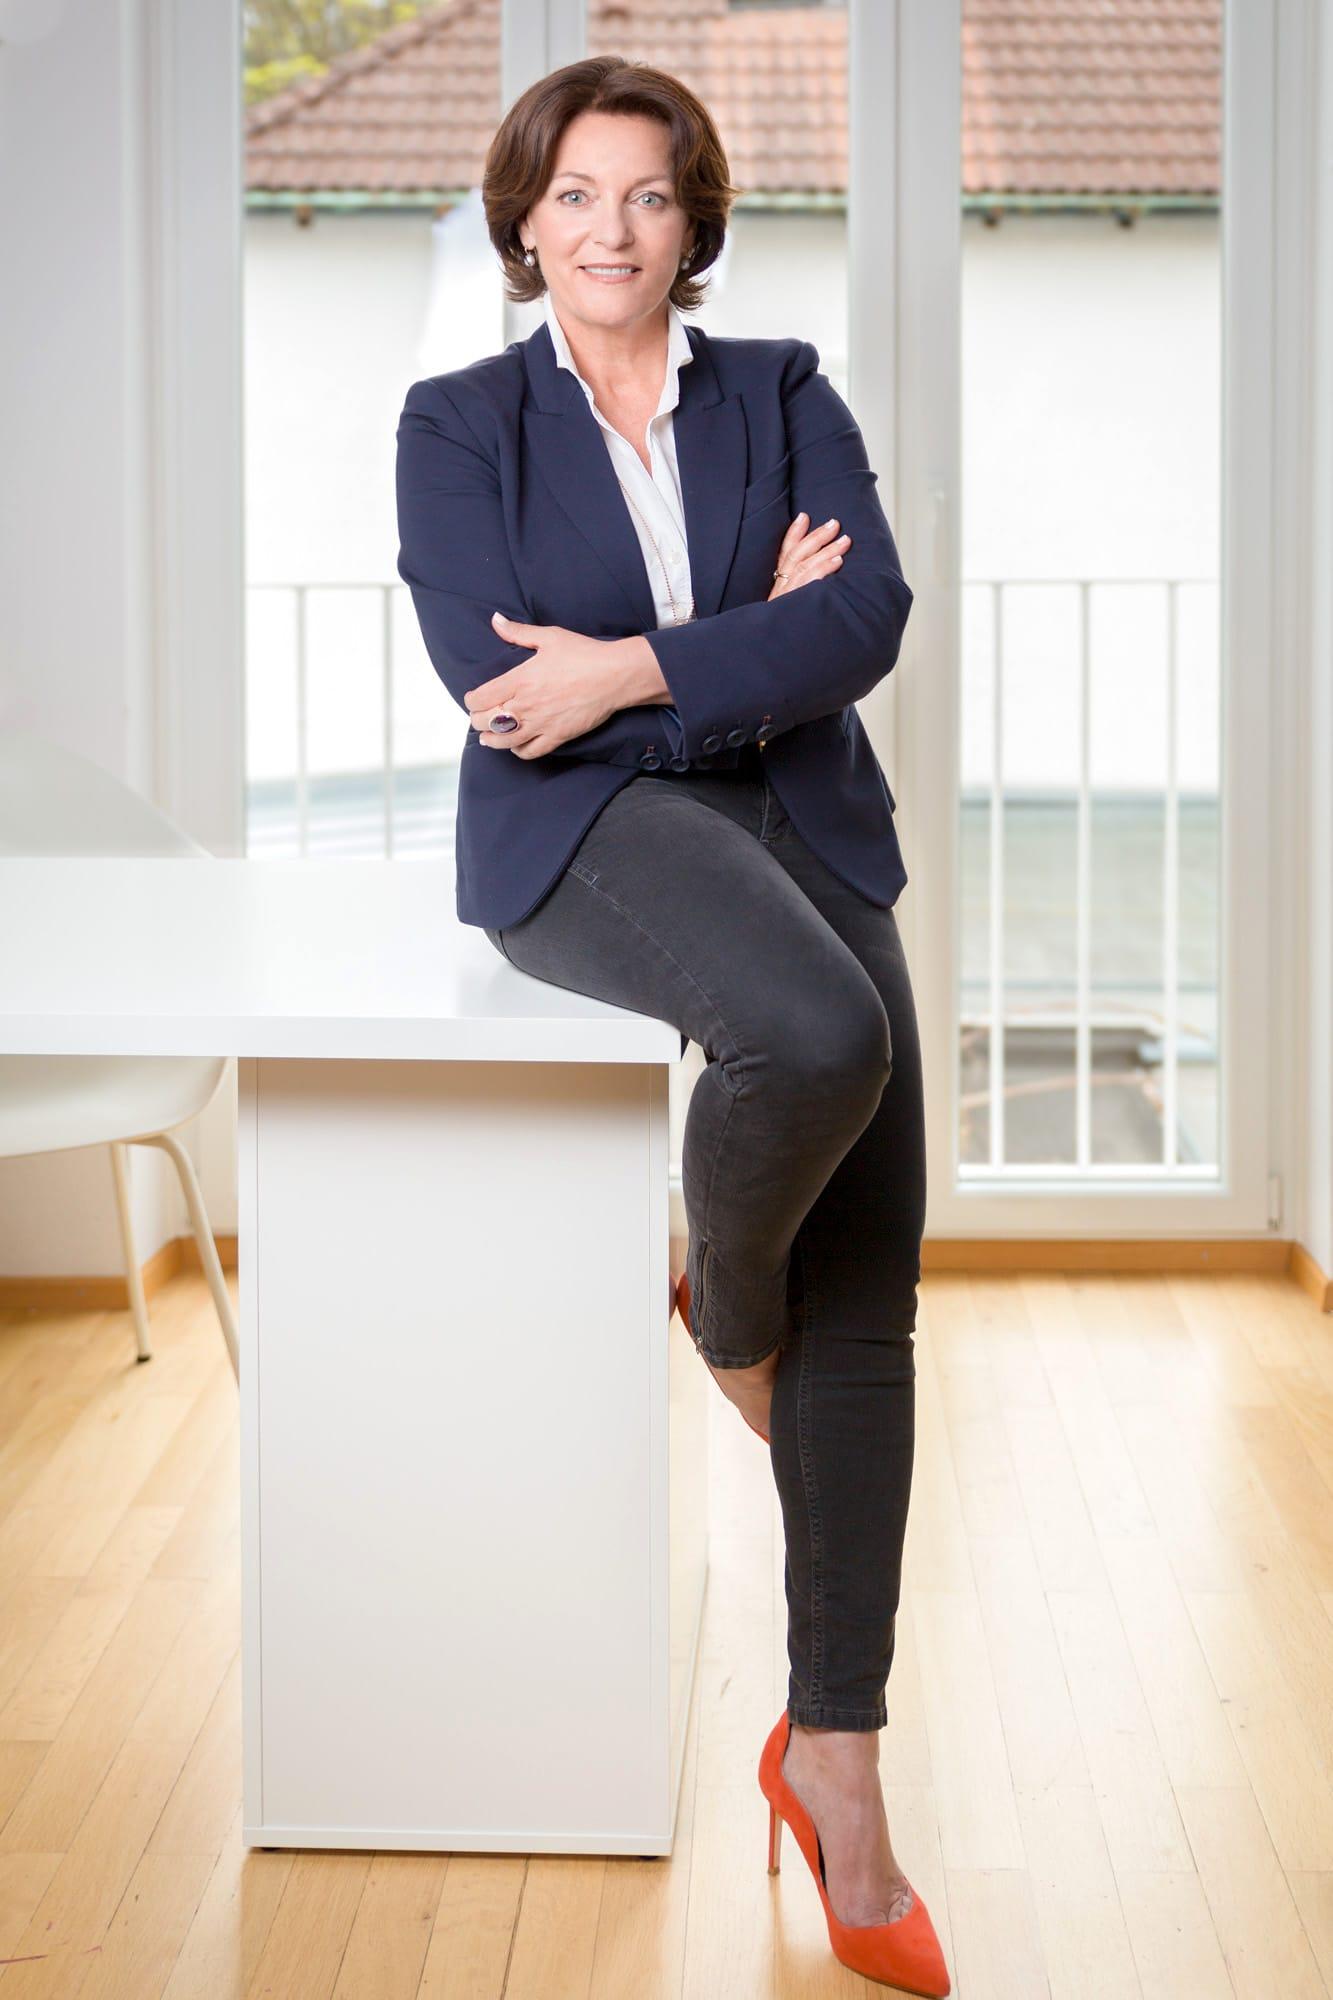 Sigrid Gillmeier-Dirks Coaching, Training, Beratung